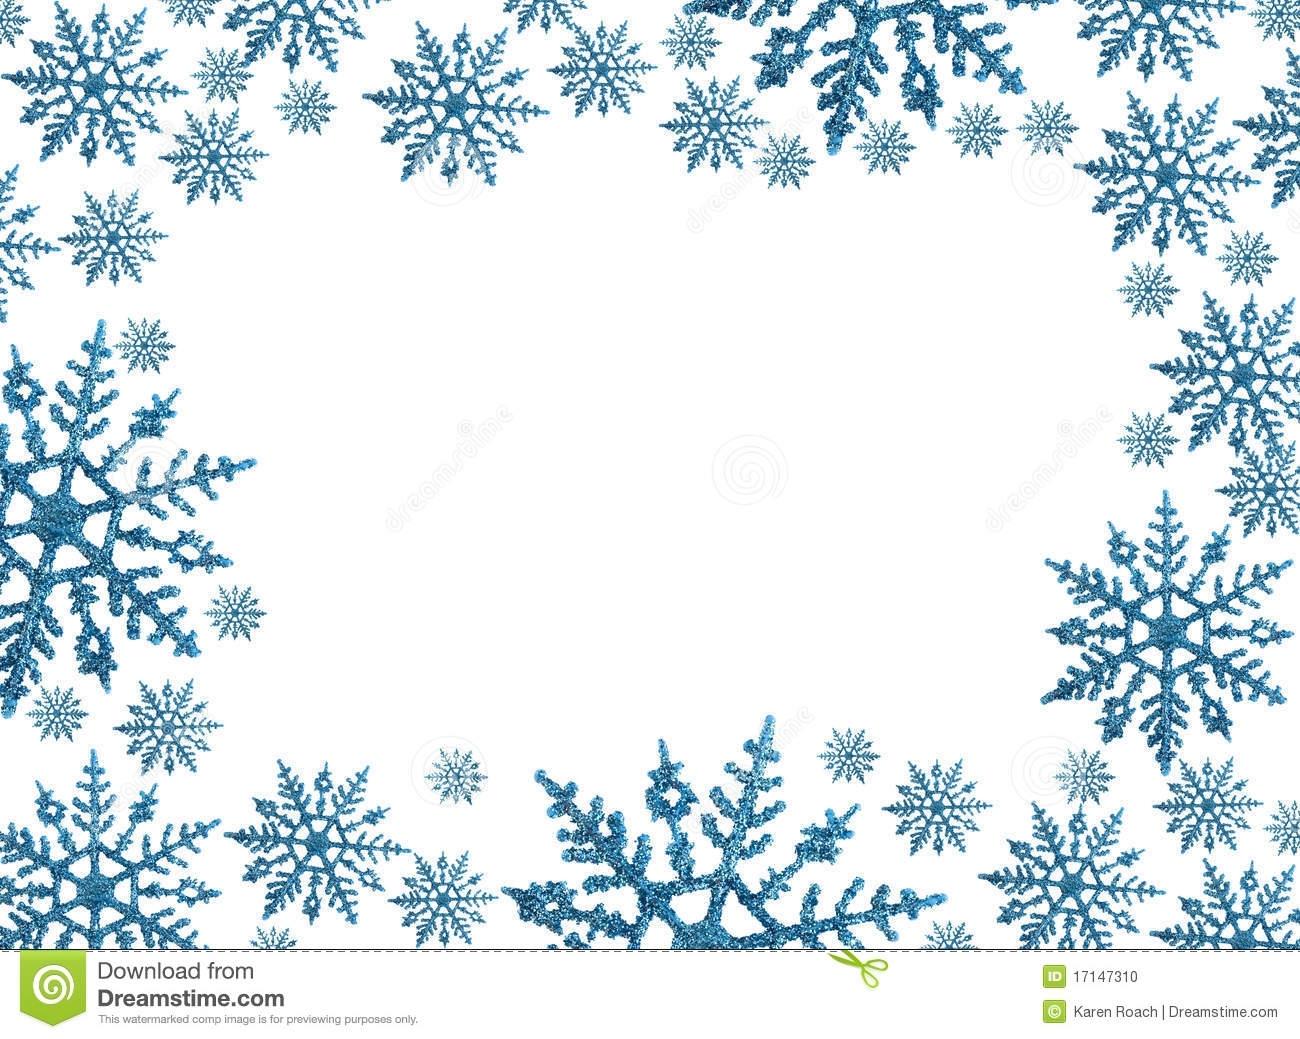 Boarder clipart transparent background. Snowflake border scrapheap clipartxtras